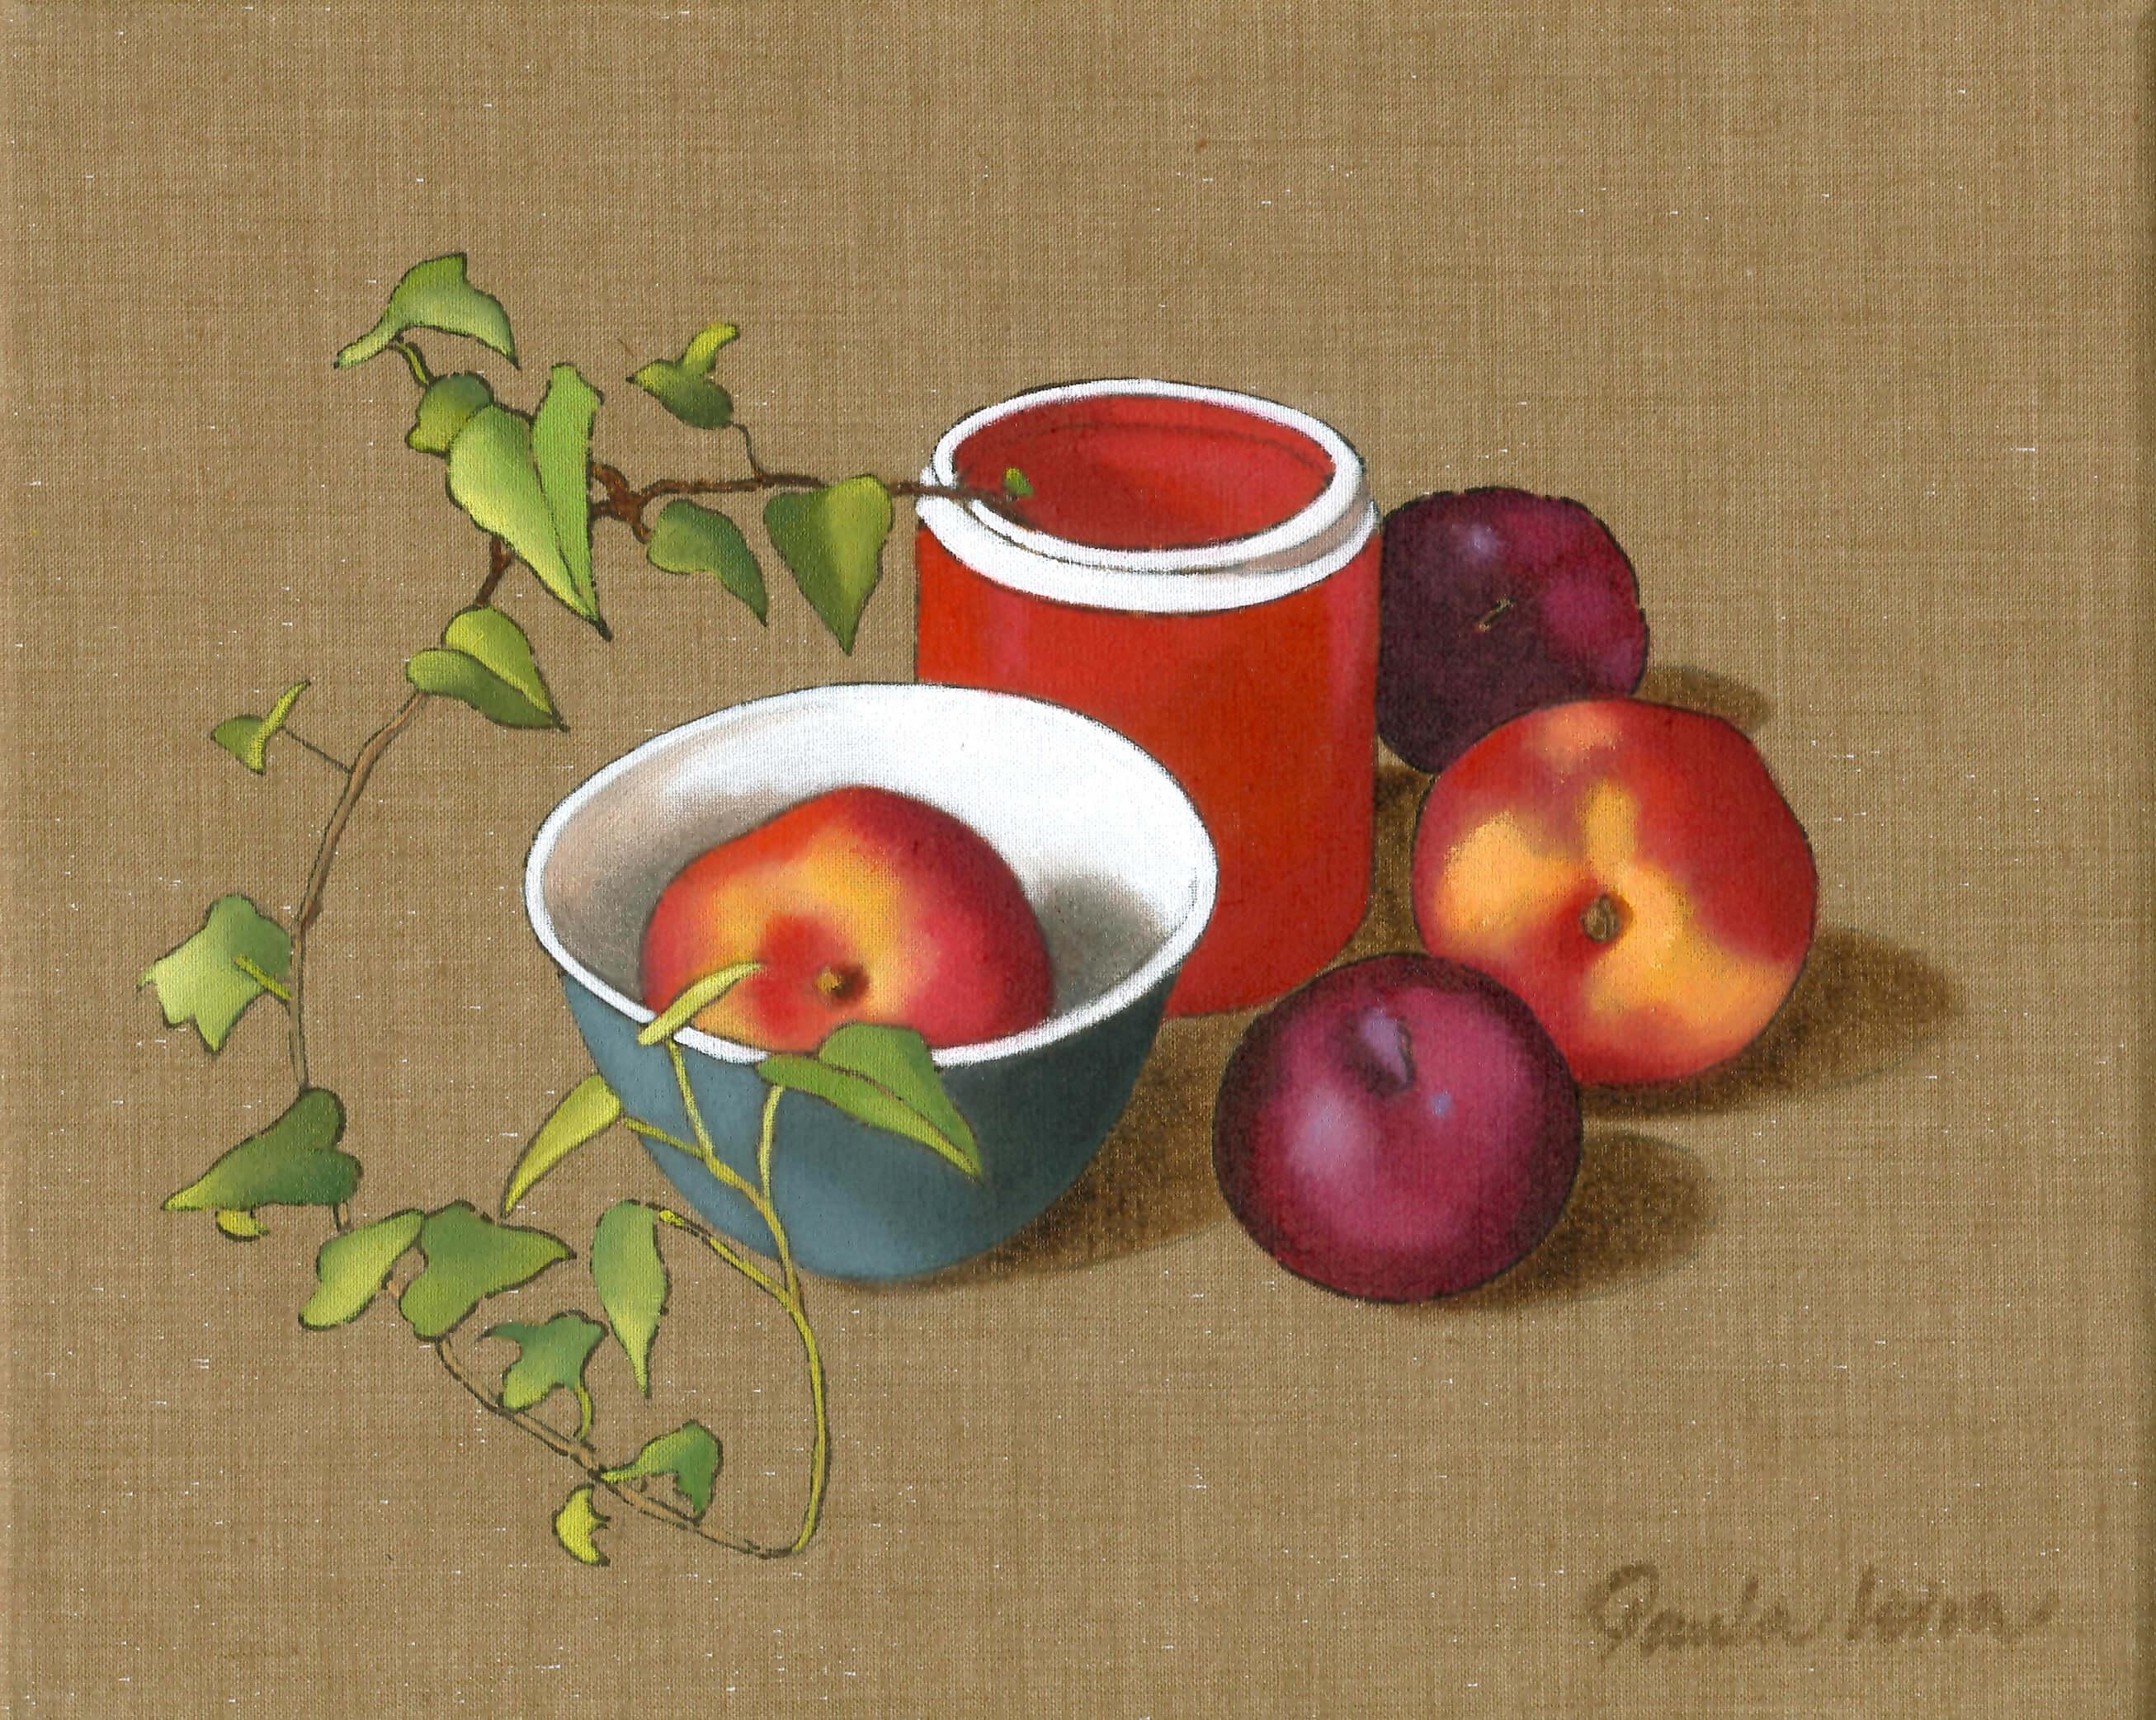 Leiva-GrangerPaula-Nectarinas-y-ciruelas.-2007Óleo-sobre-tela-22-x-27-cm.-3 Paula Leiva